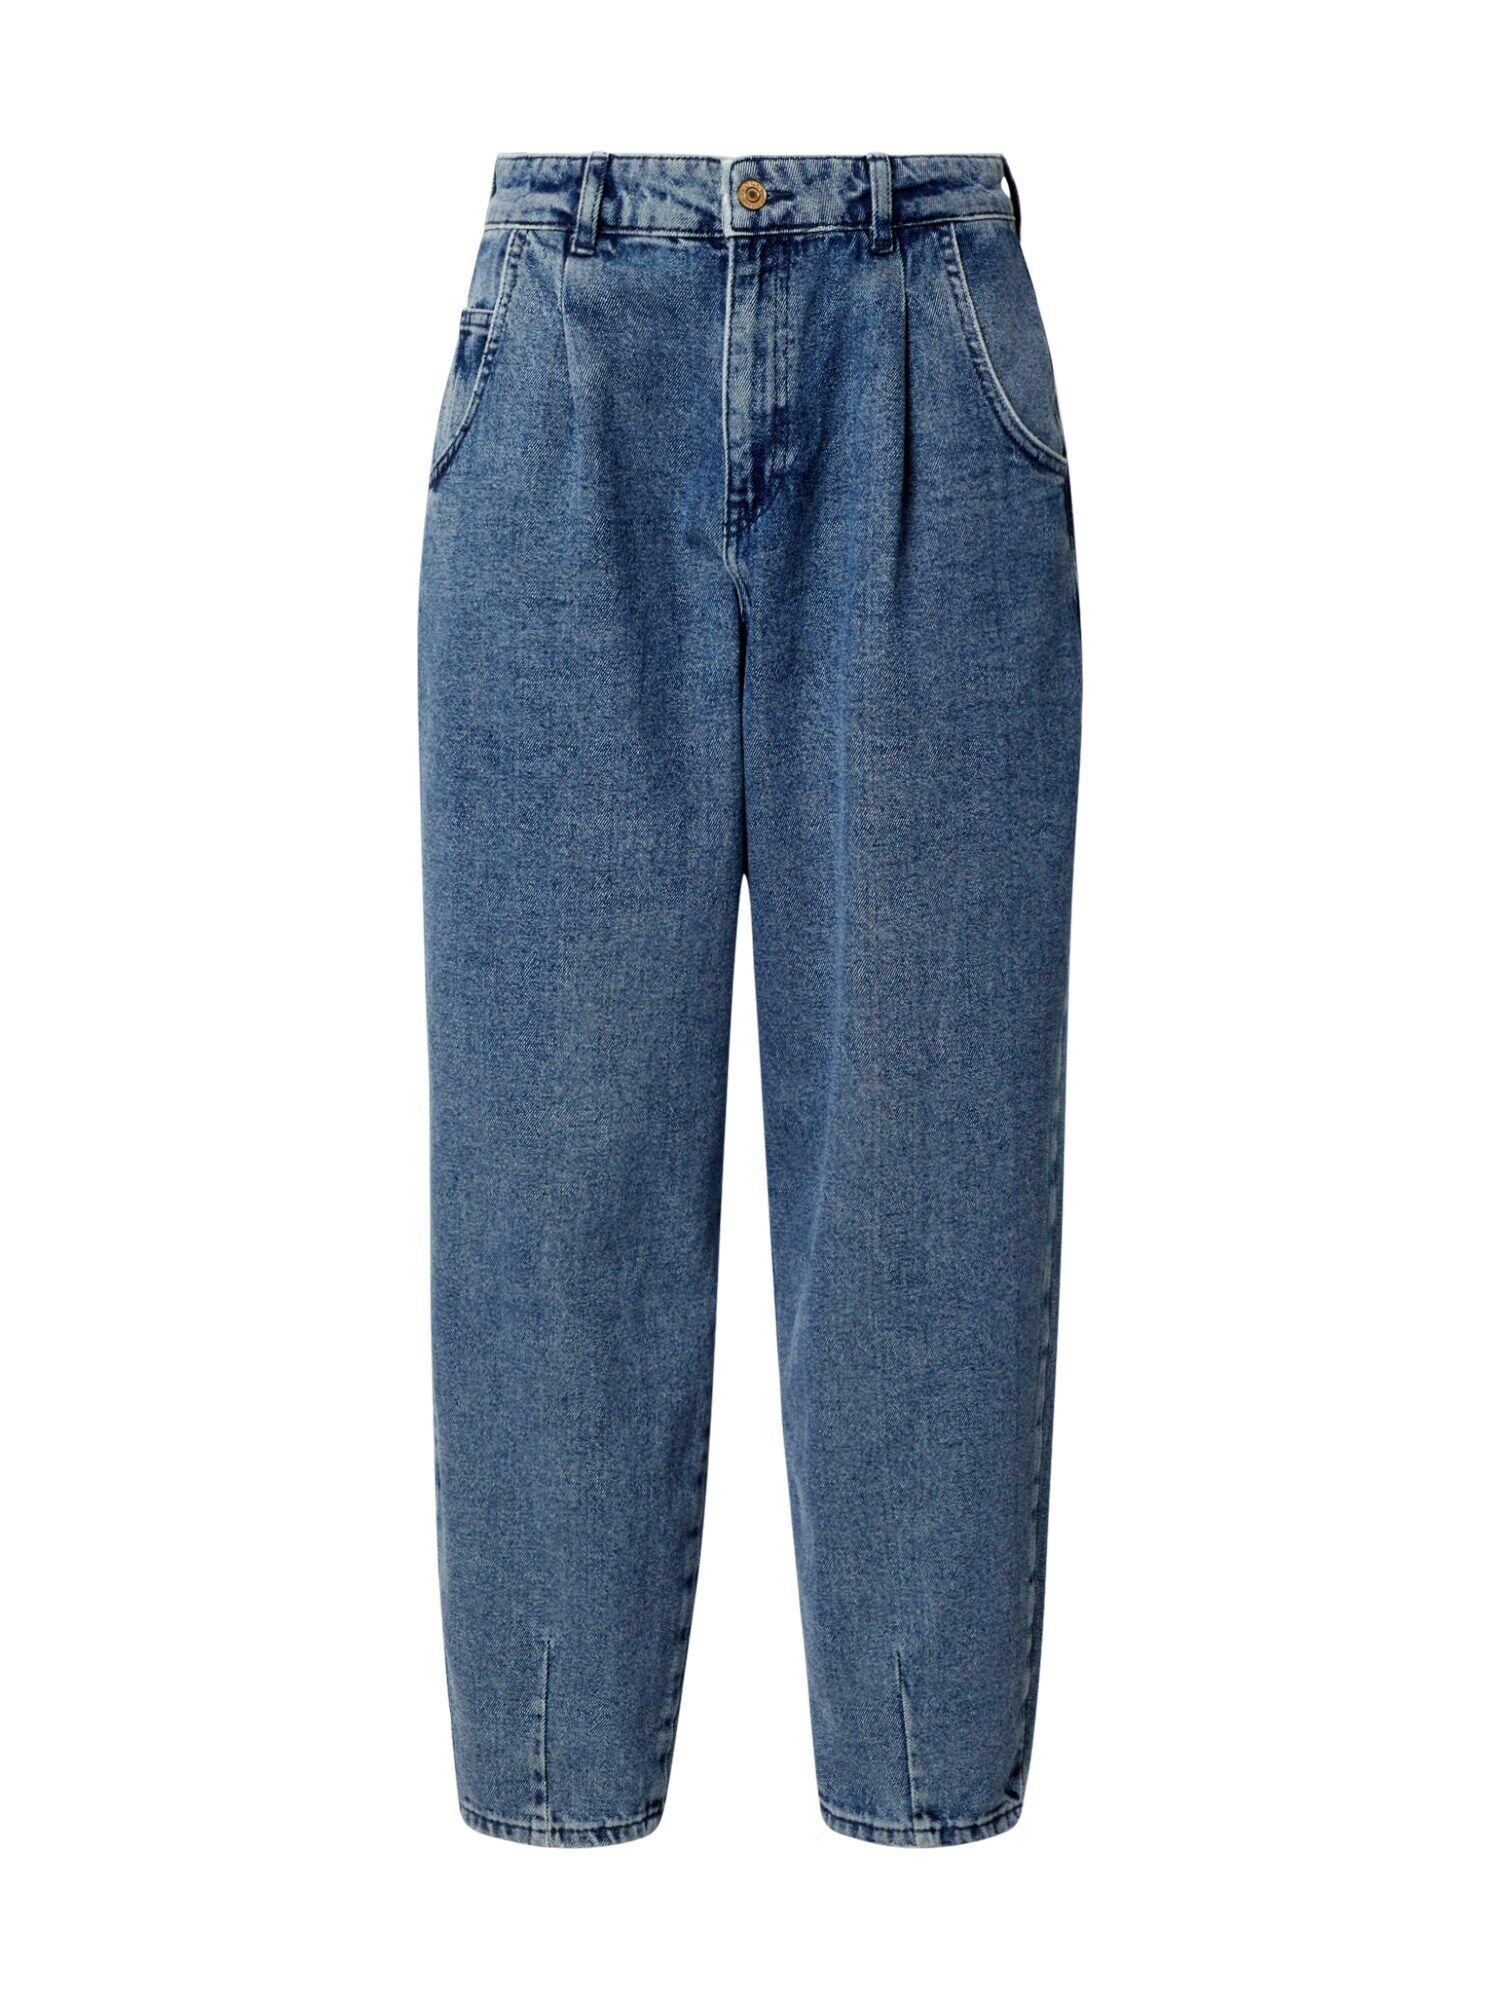 ONLY Jean à pince 'VERNA'  - Bleu - Taille: M - female